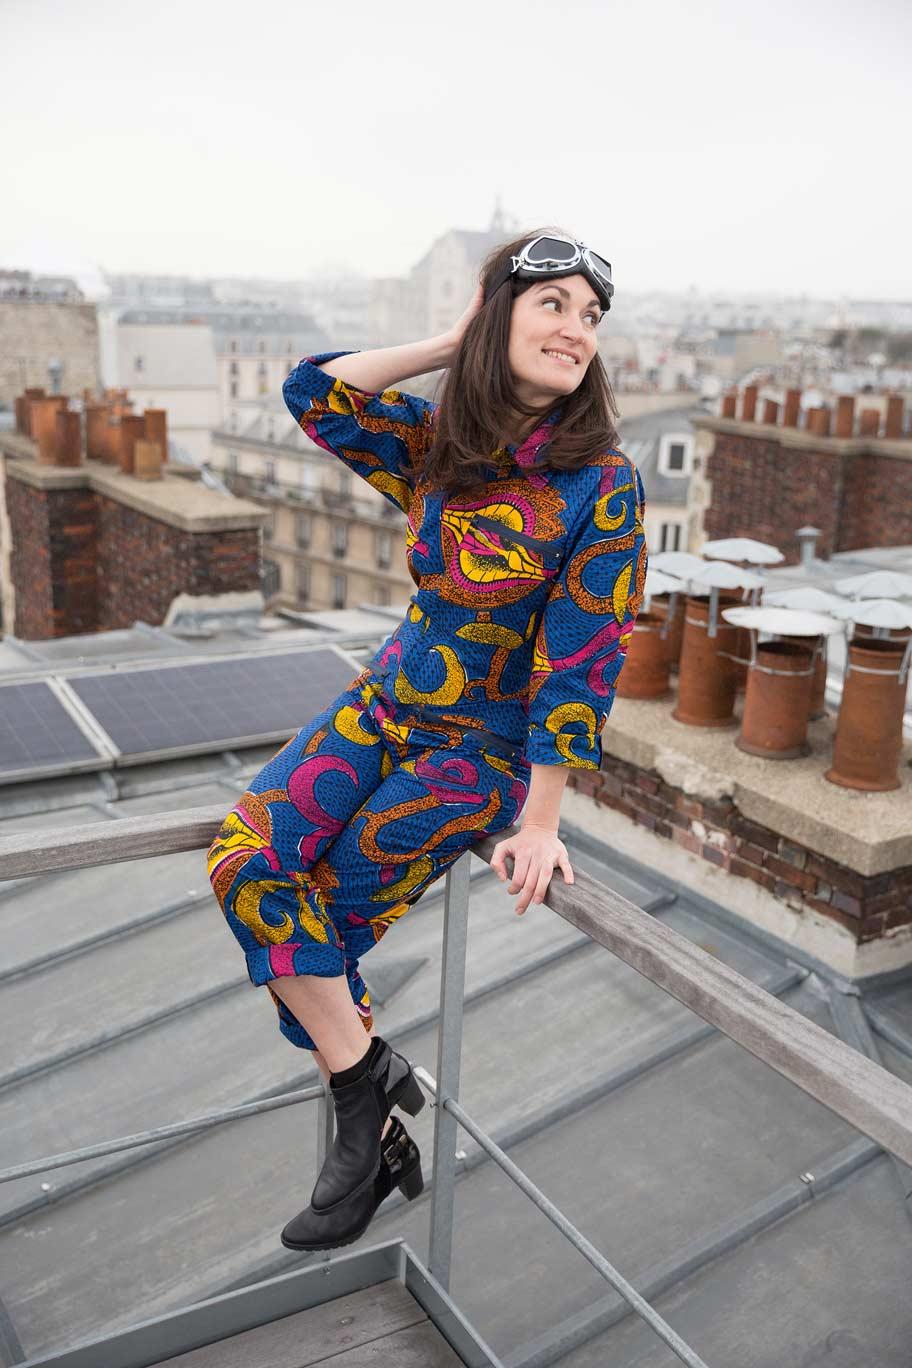 Ines-Aramburo-photographe-paris-portrait-lifestyle-seance-photo-photoshoot-photographer25.jpg